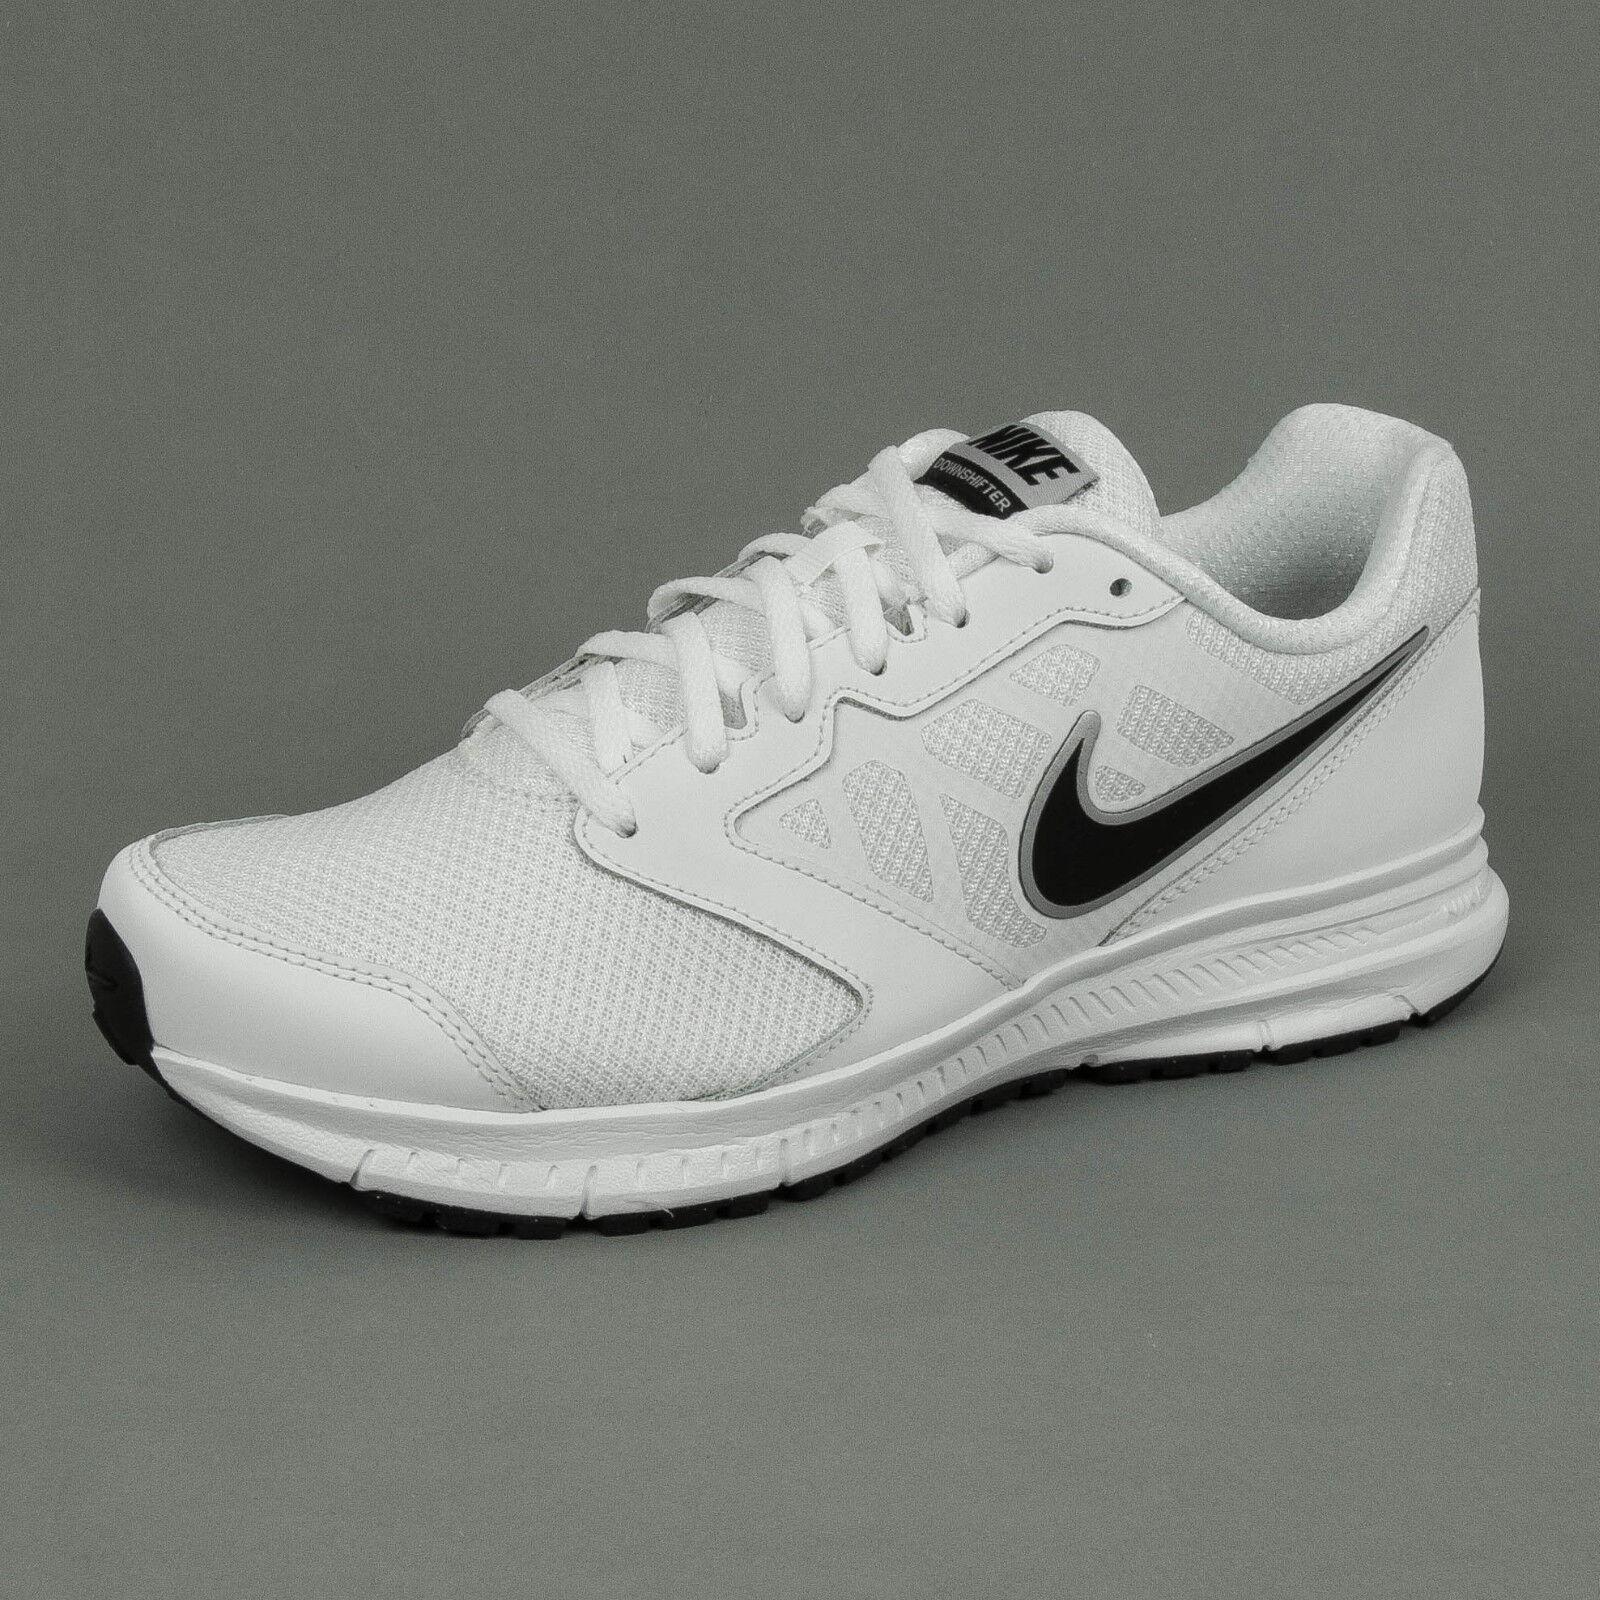 Nike Sportschuhe Downshifter 6 Test Vergleich +++ Nike